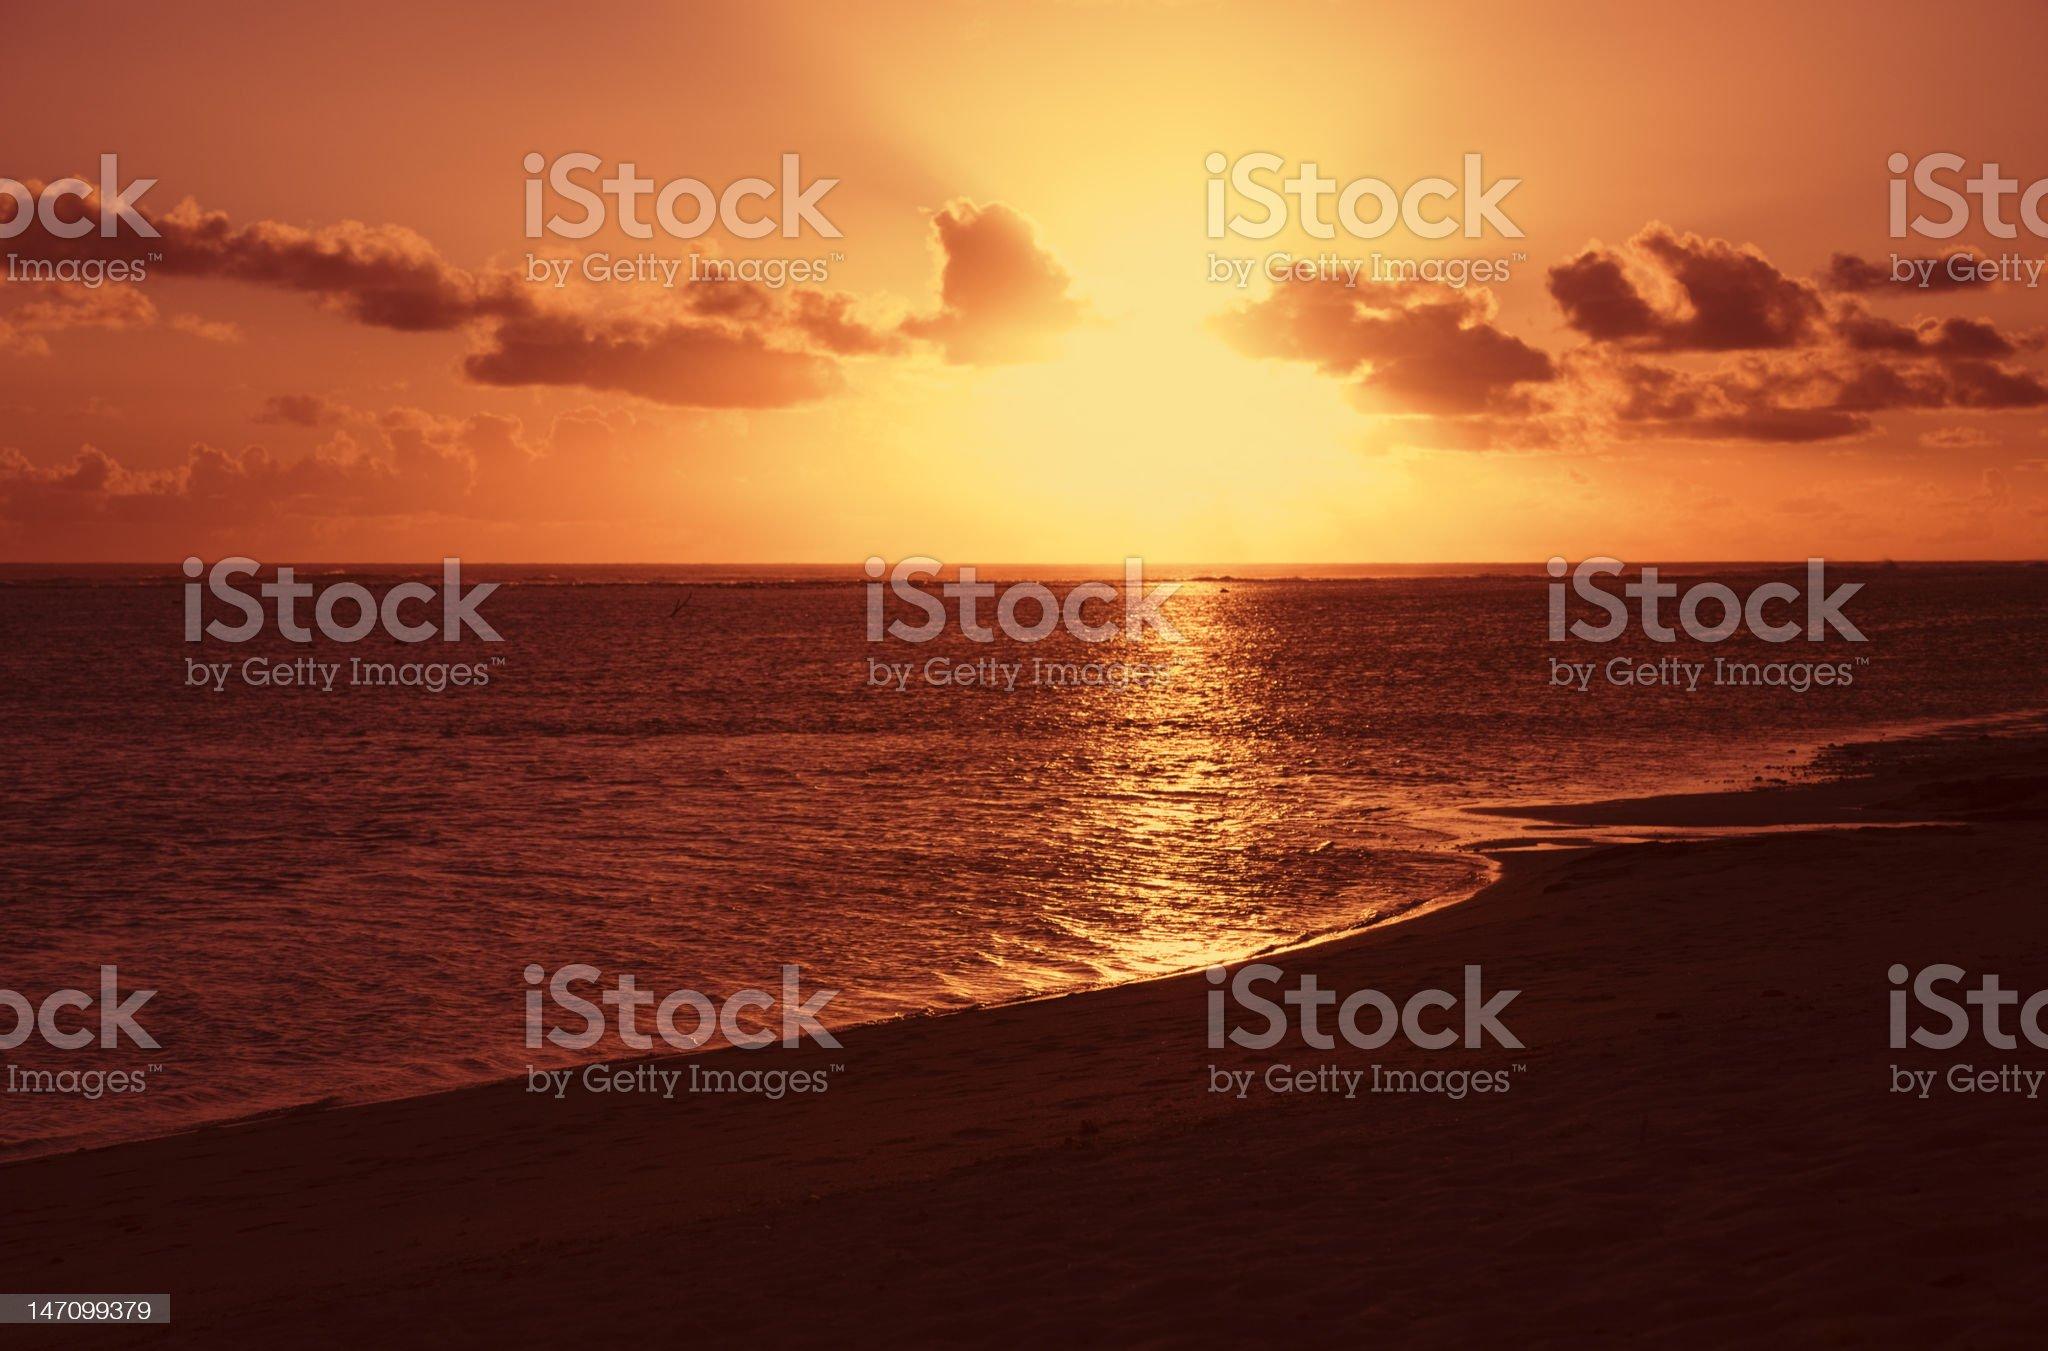 Sun shining through Clouds at Sunset royalty-free stock photo